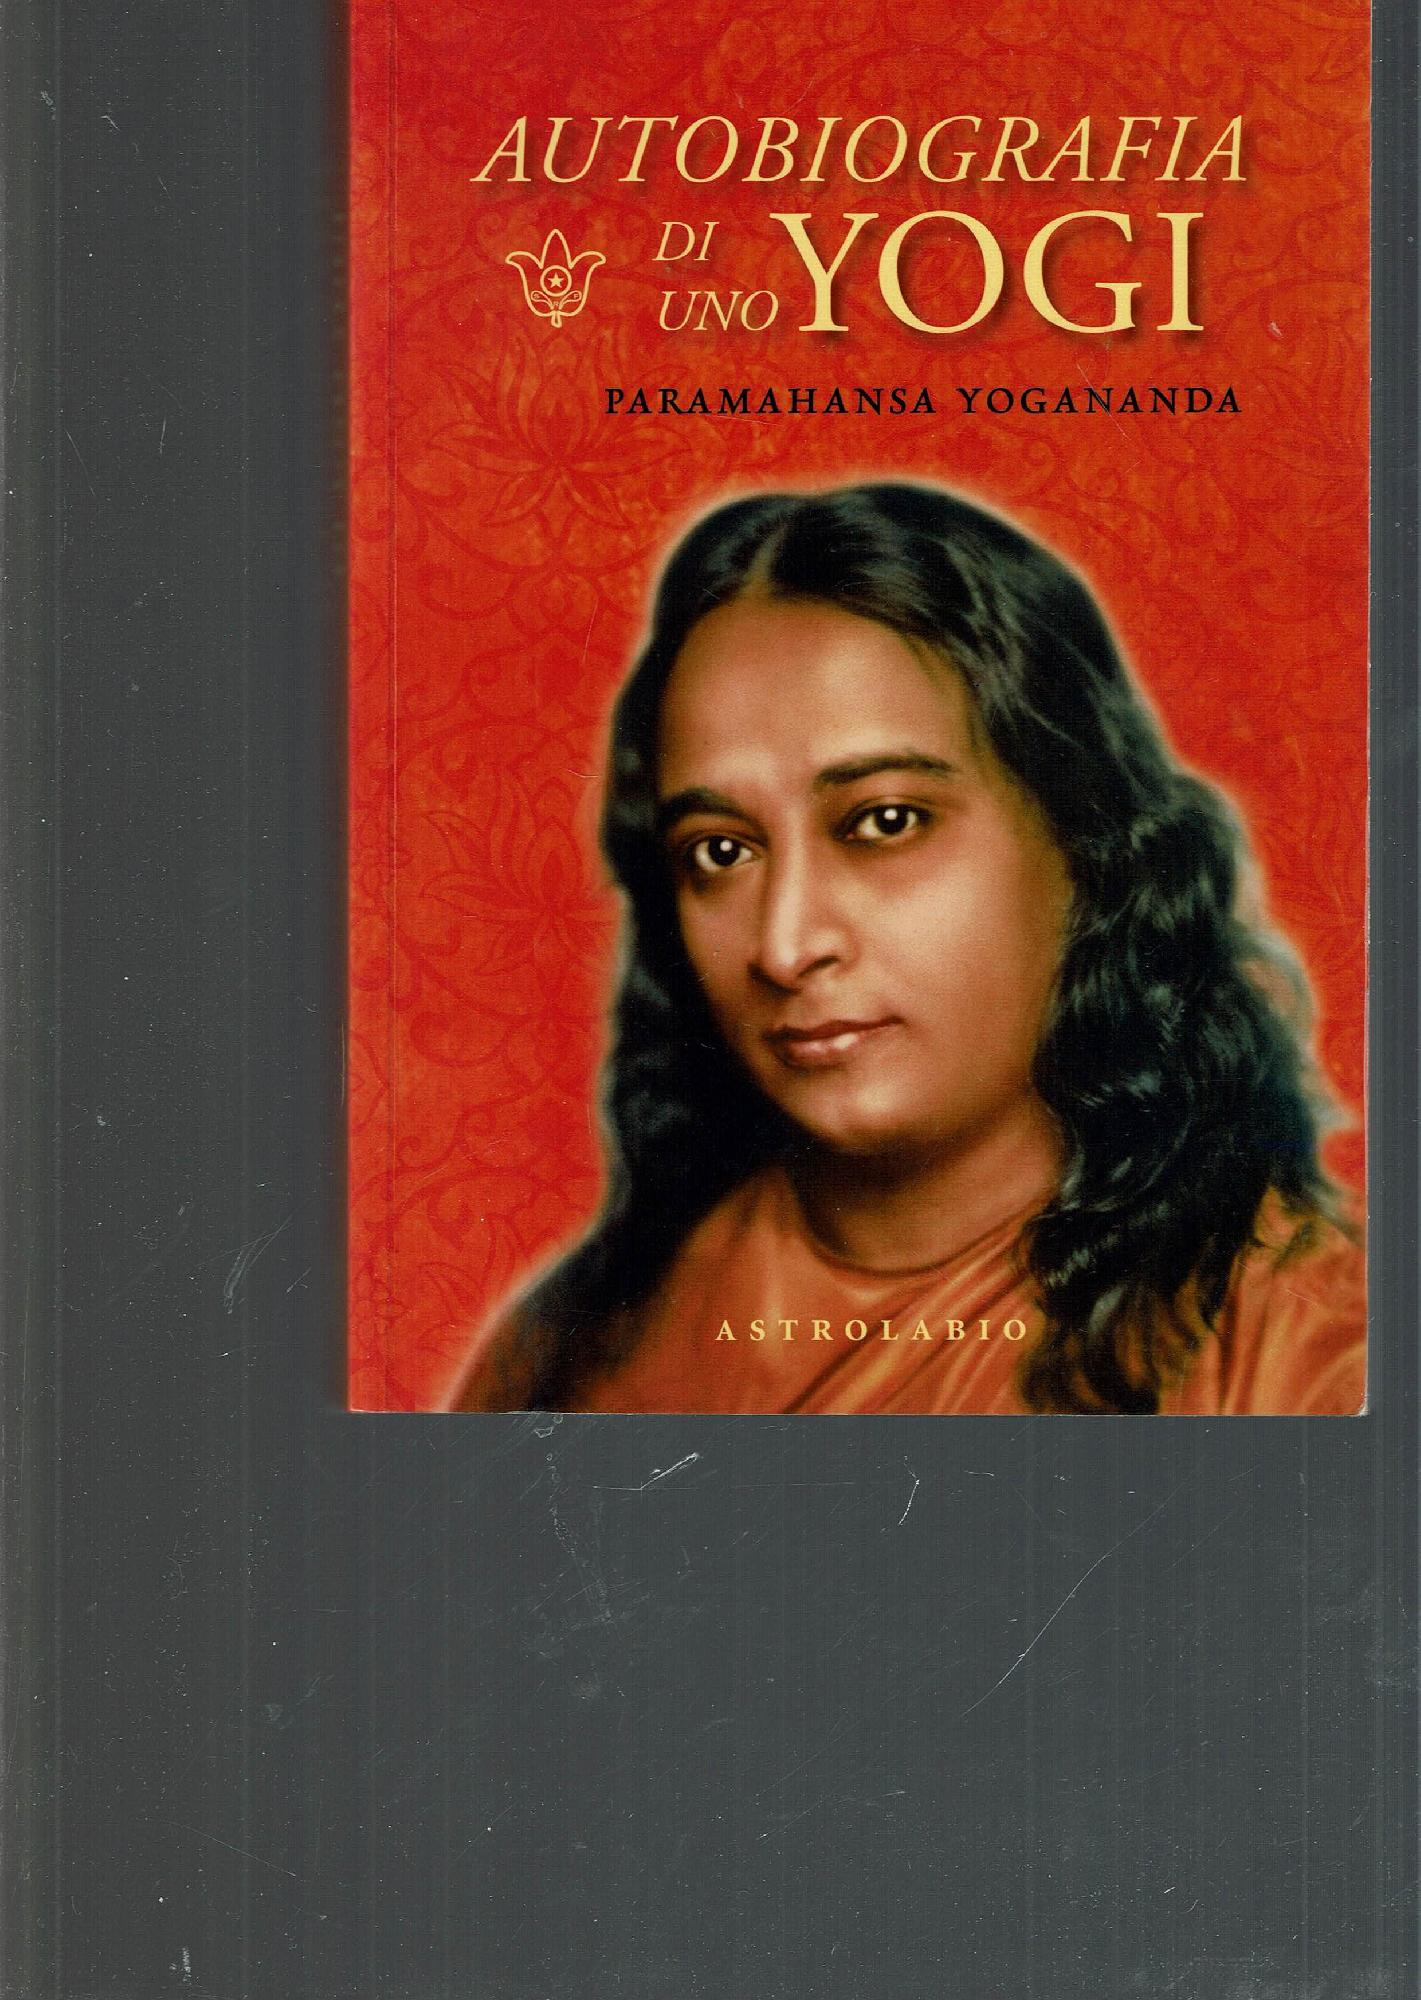 Autobiografia di uno yogi + CD - Yogananda, ParamhansaWentz, Walter Yeeling Evans